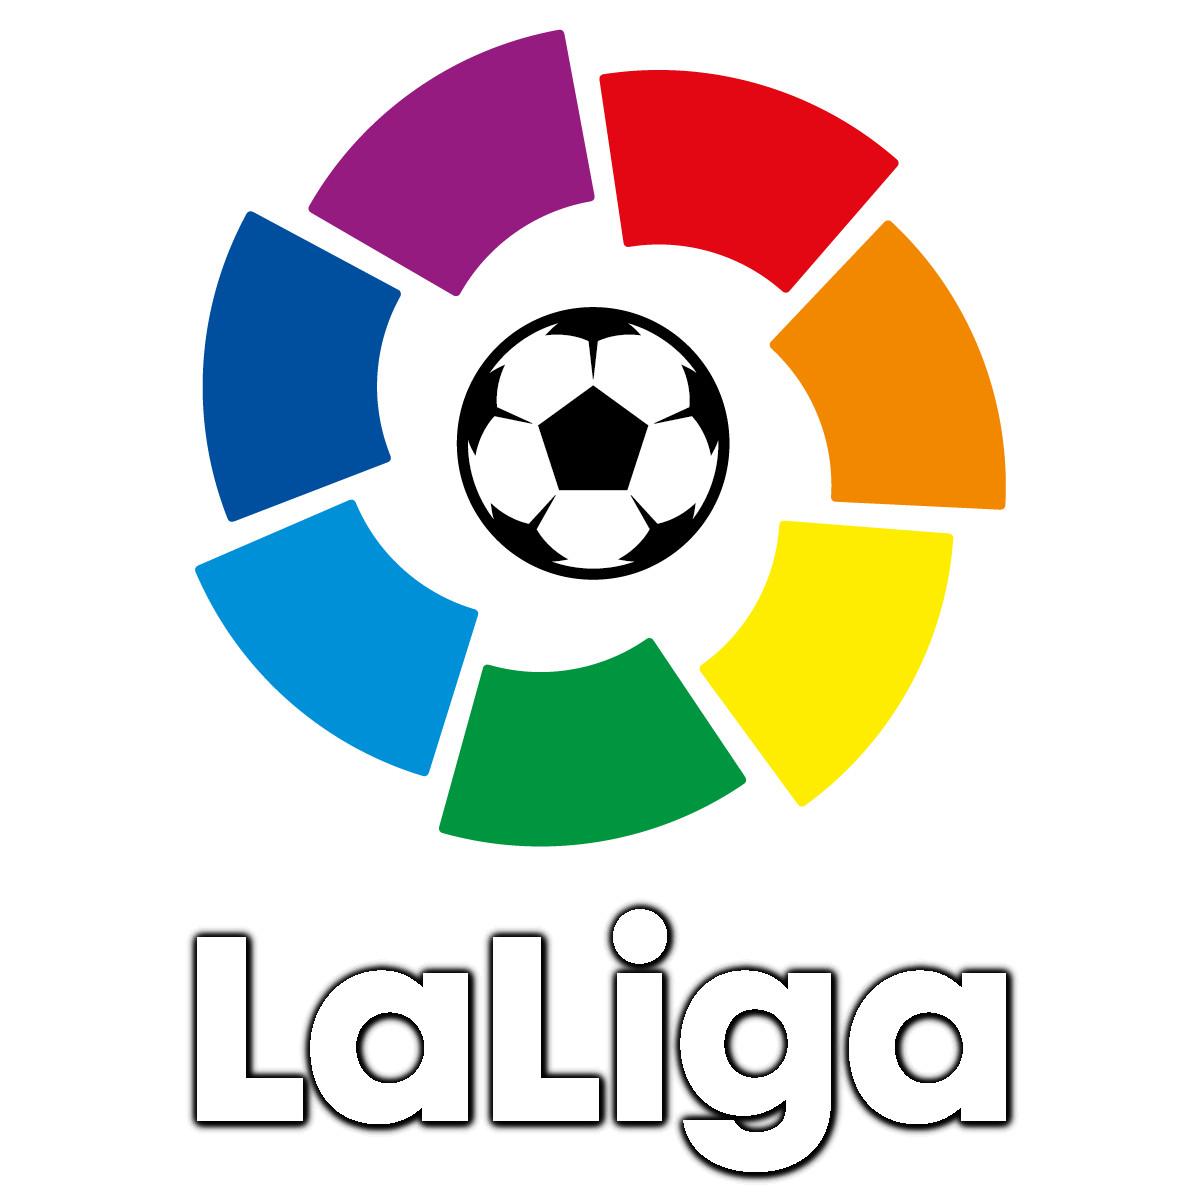 Spanyol Bajnokság